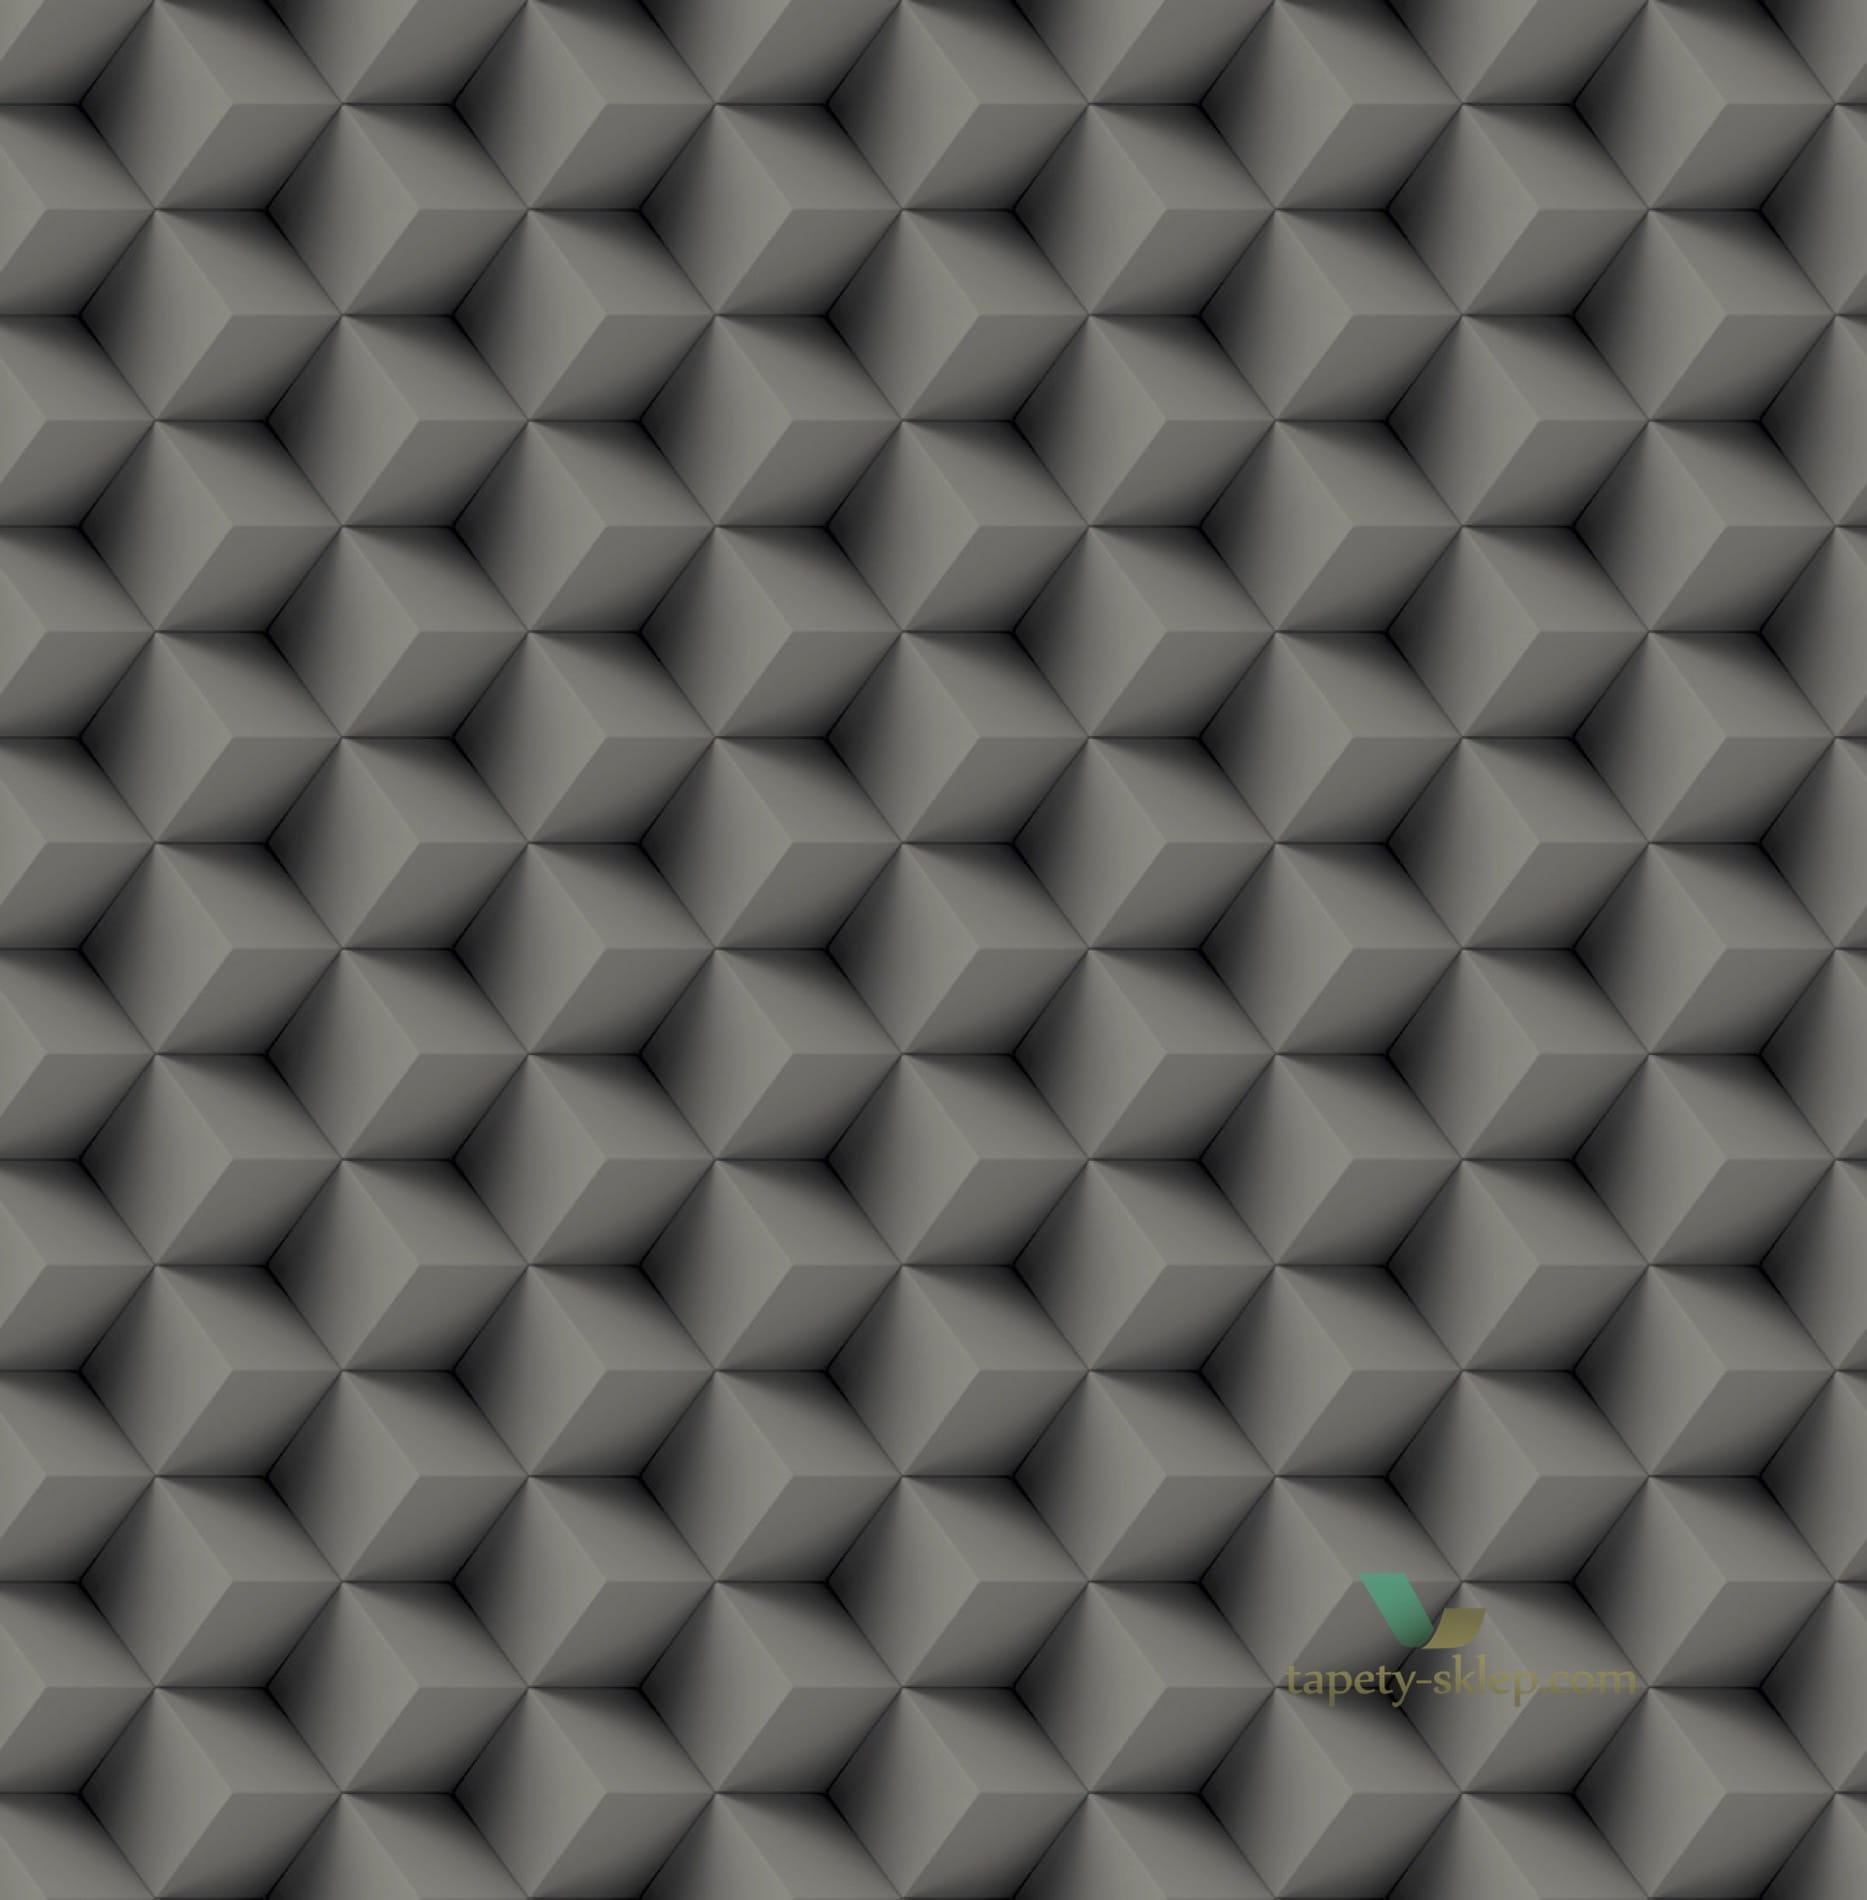 Tapeta TD30600 Wallquest 3D - Wallquest 3D - Sklep internetowy www.tapety-sklep.com